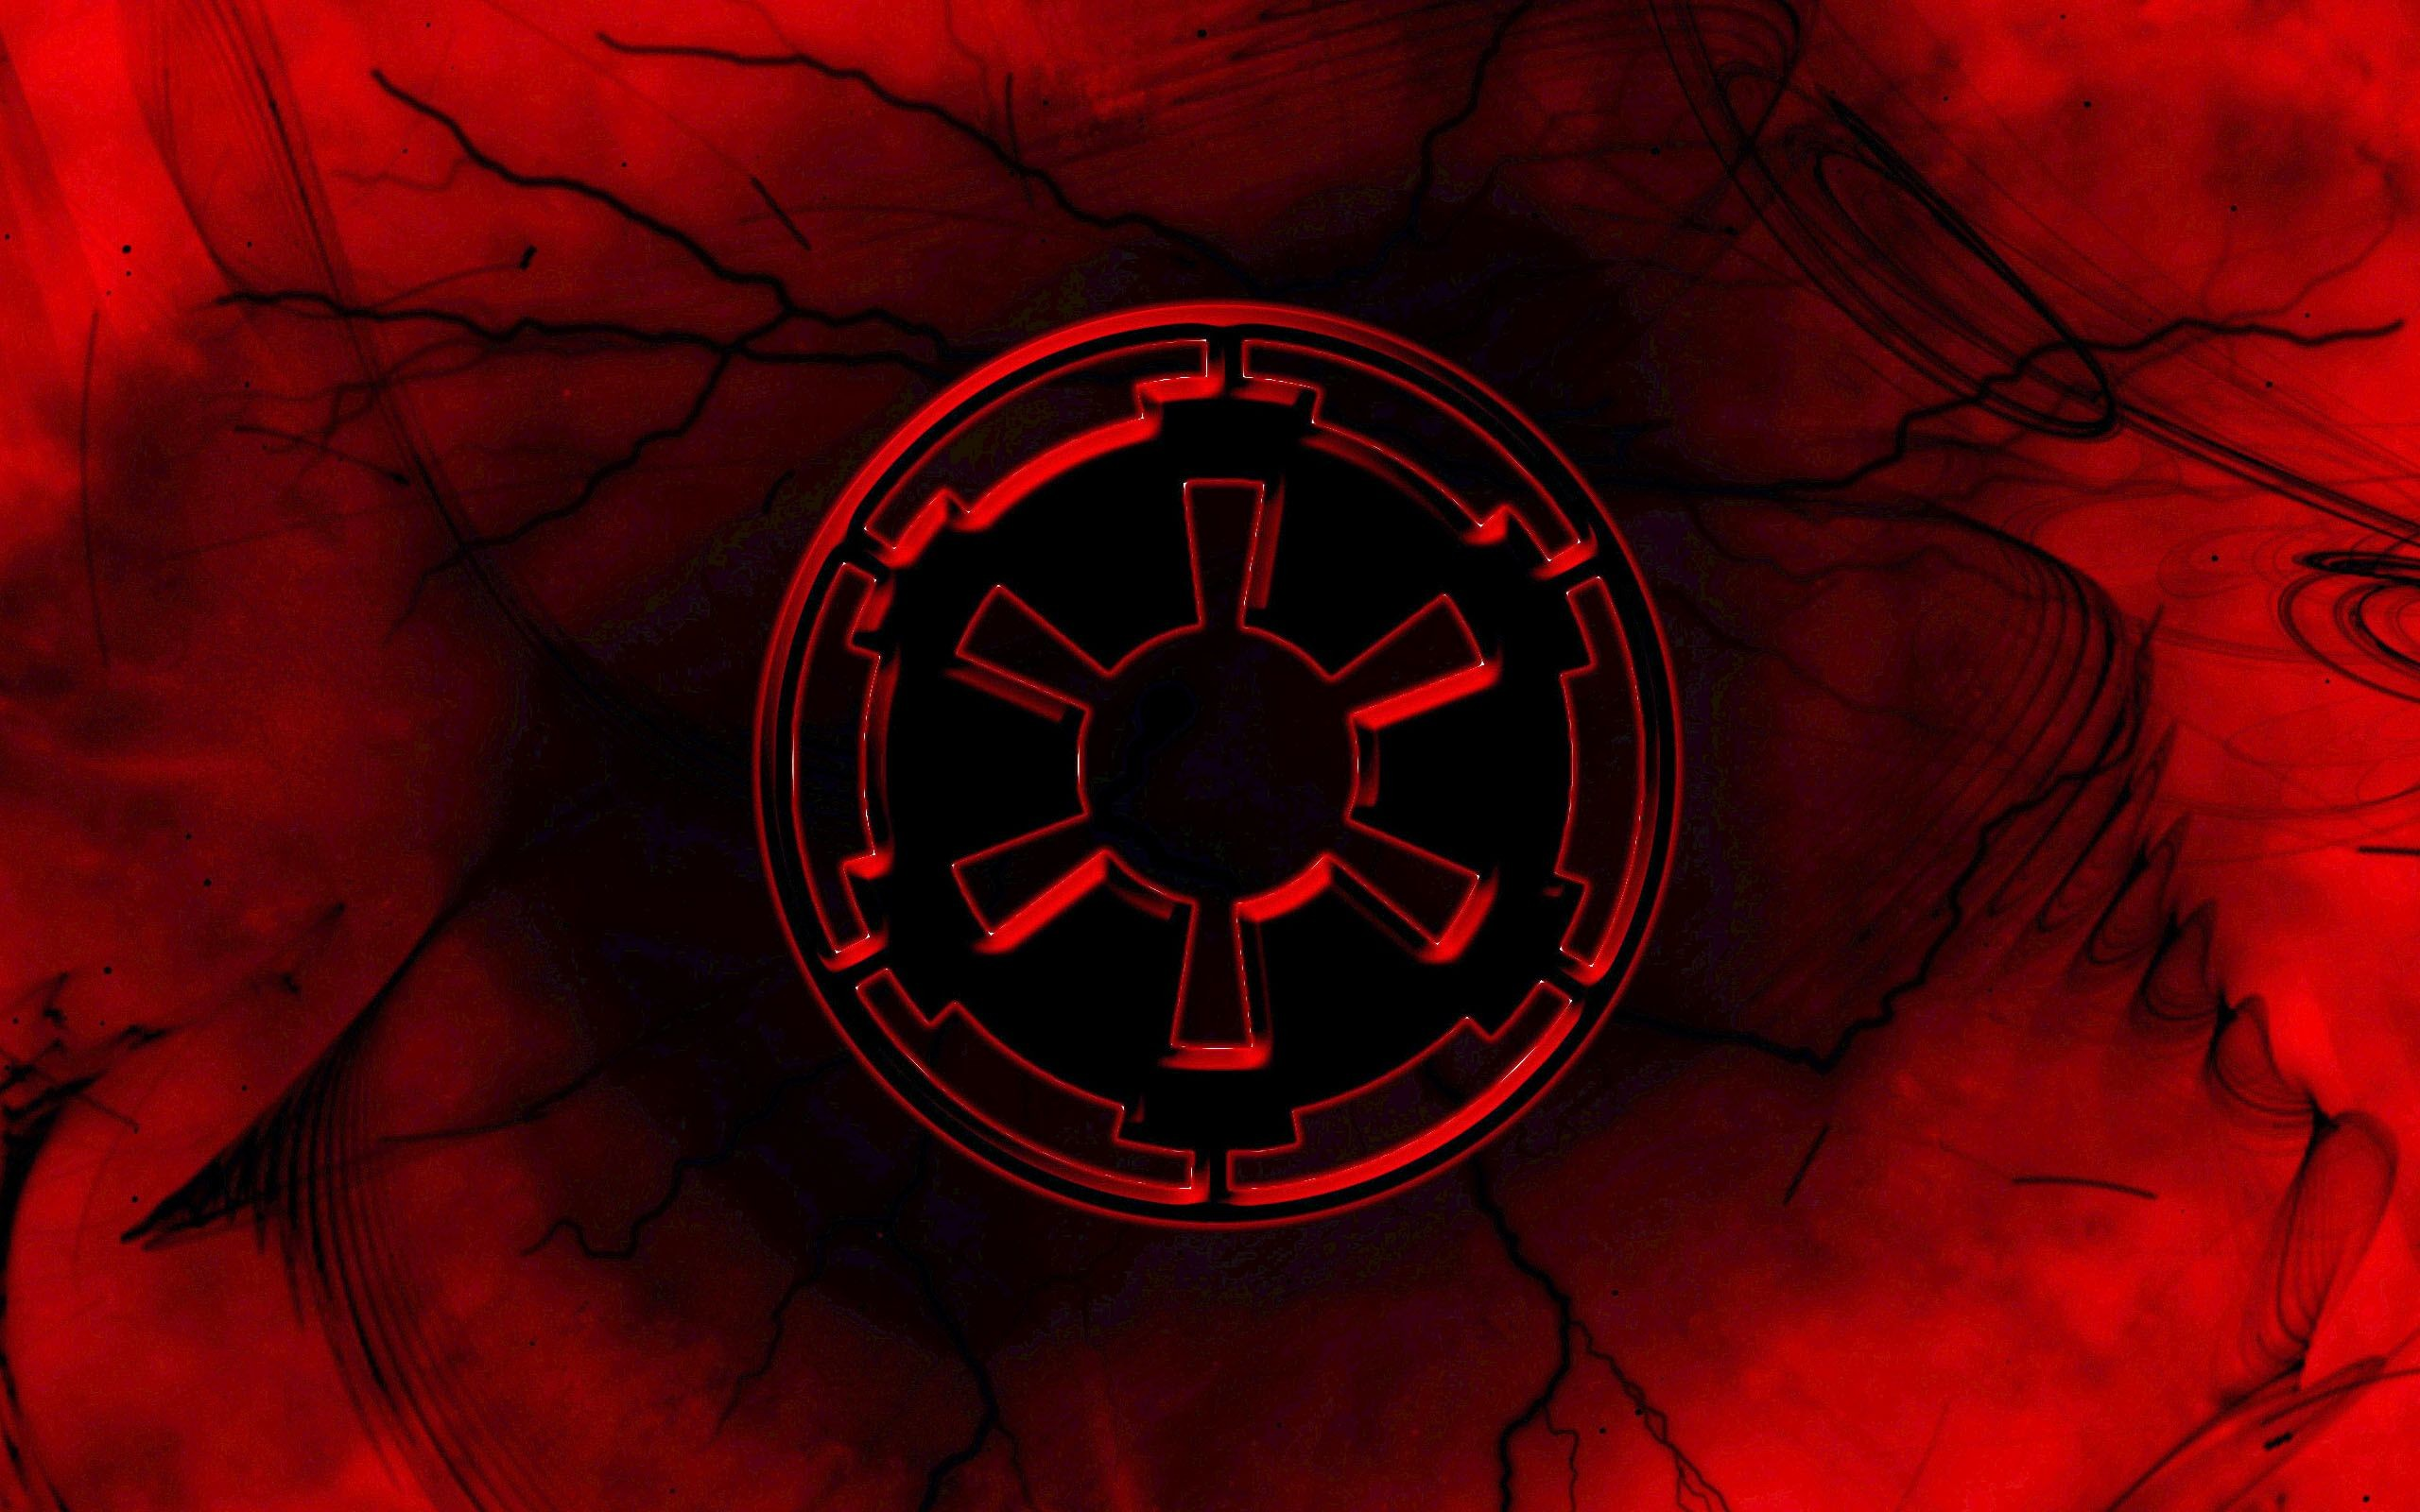 144 Star Wars Imperial Wallpaper Hd